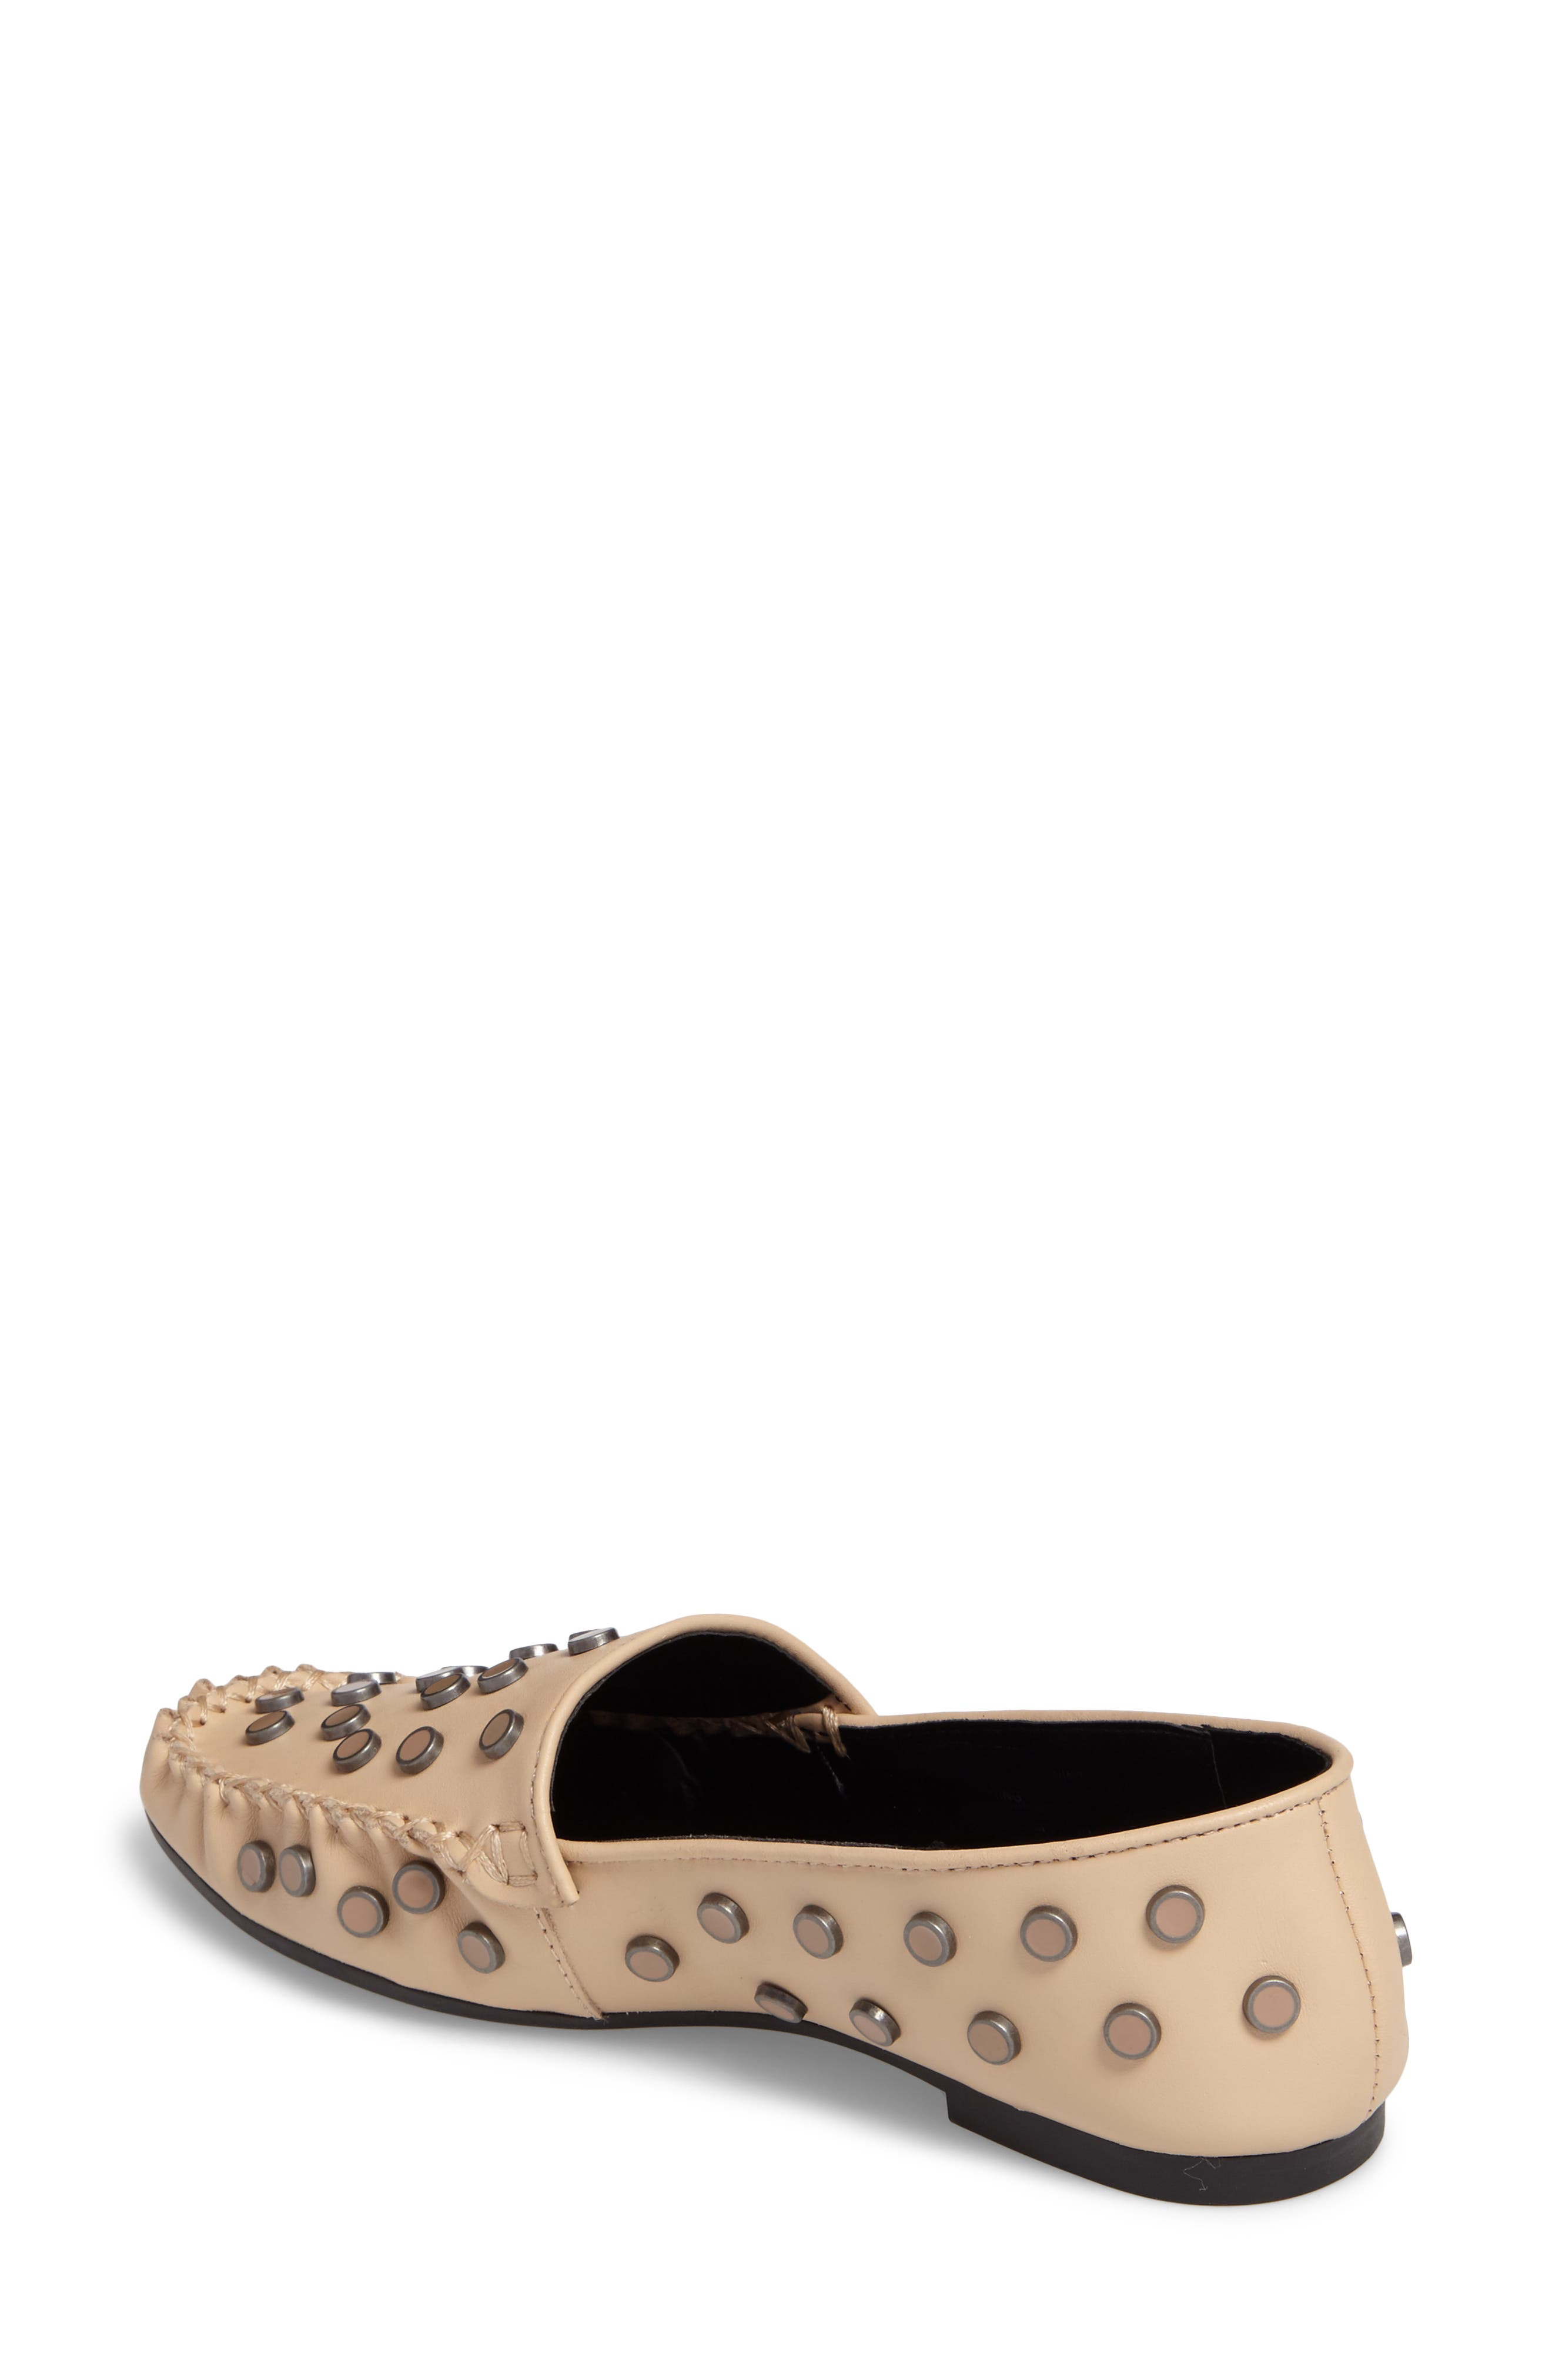 M4D3 Conneticut Loafer,                             Alternate thumbnail 2, color,                             Bisque Leather